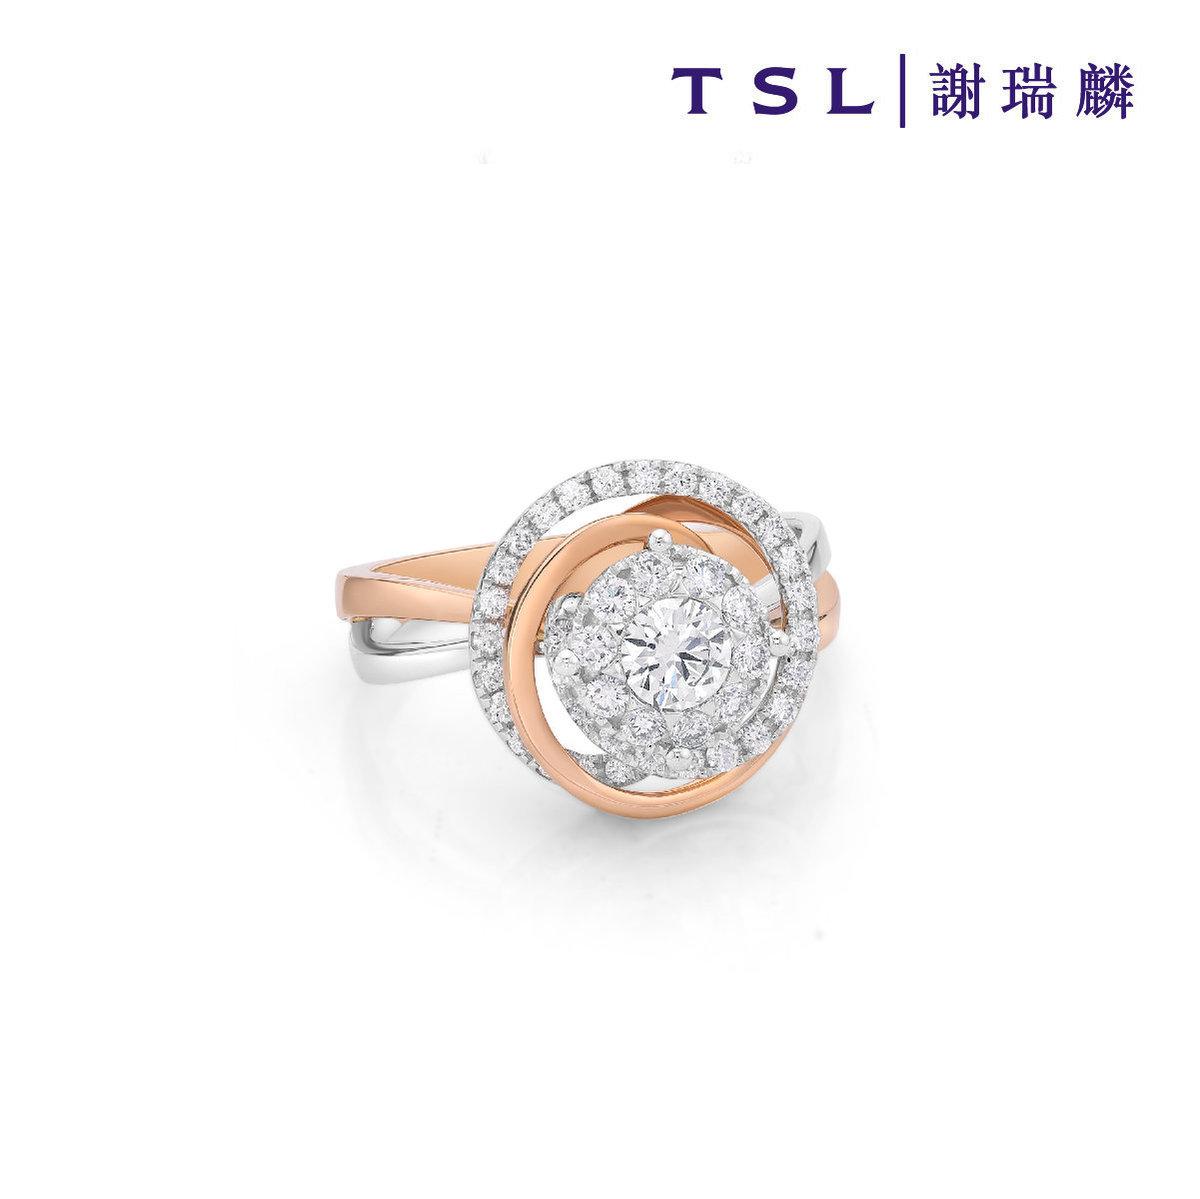 18K Rose and White Gold Diamond Ring